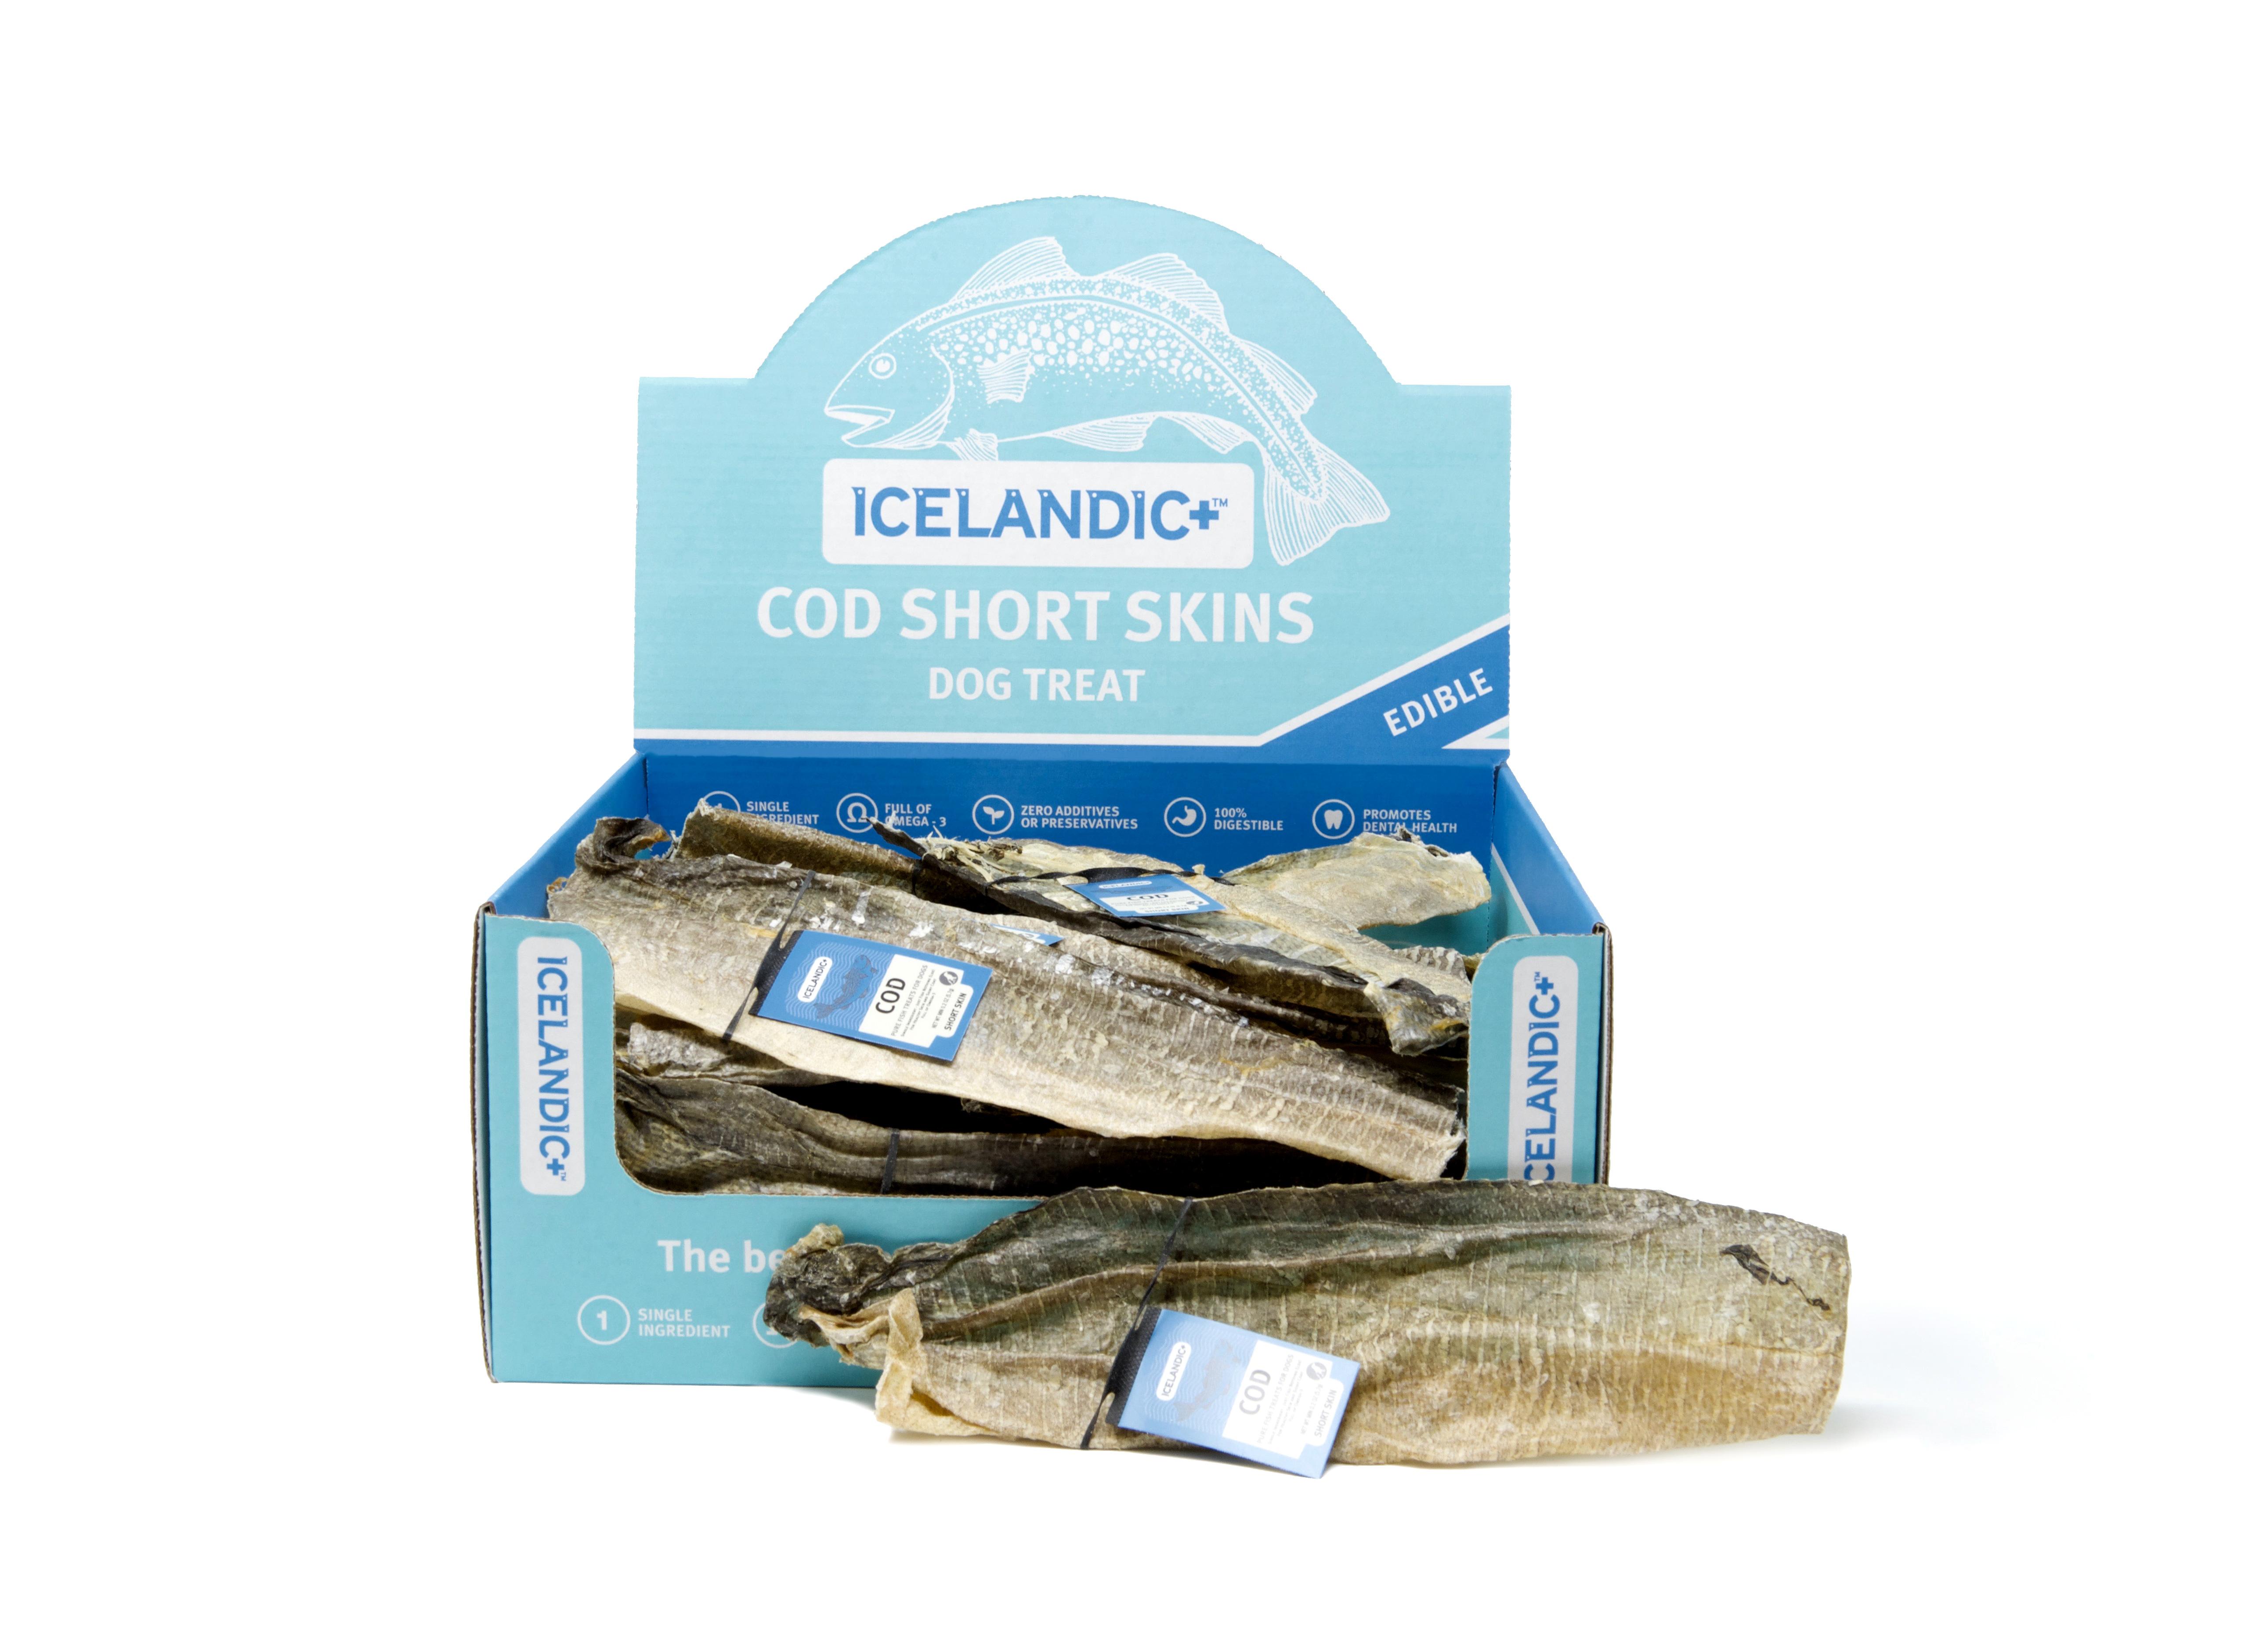 Icelandic+ Cod Short Skin Strips Fish Dog Treat, 1-count